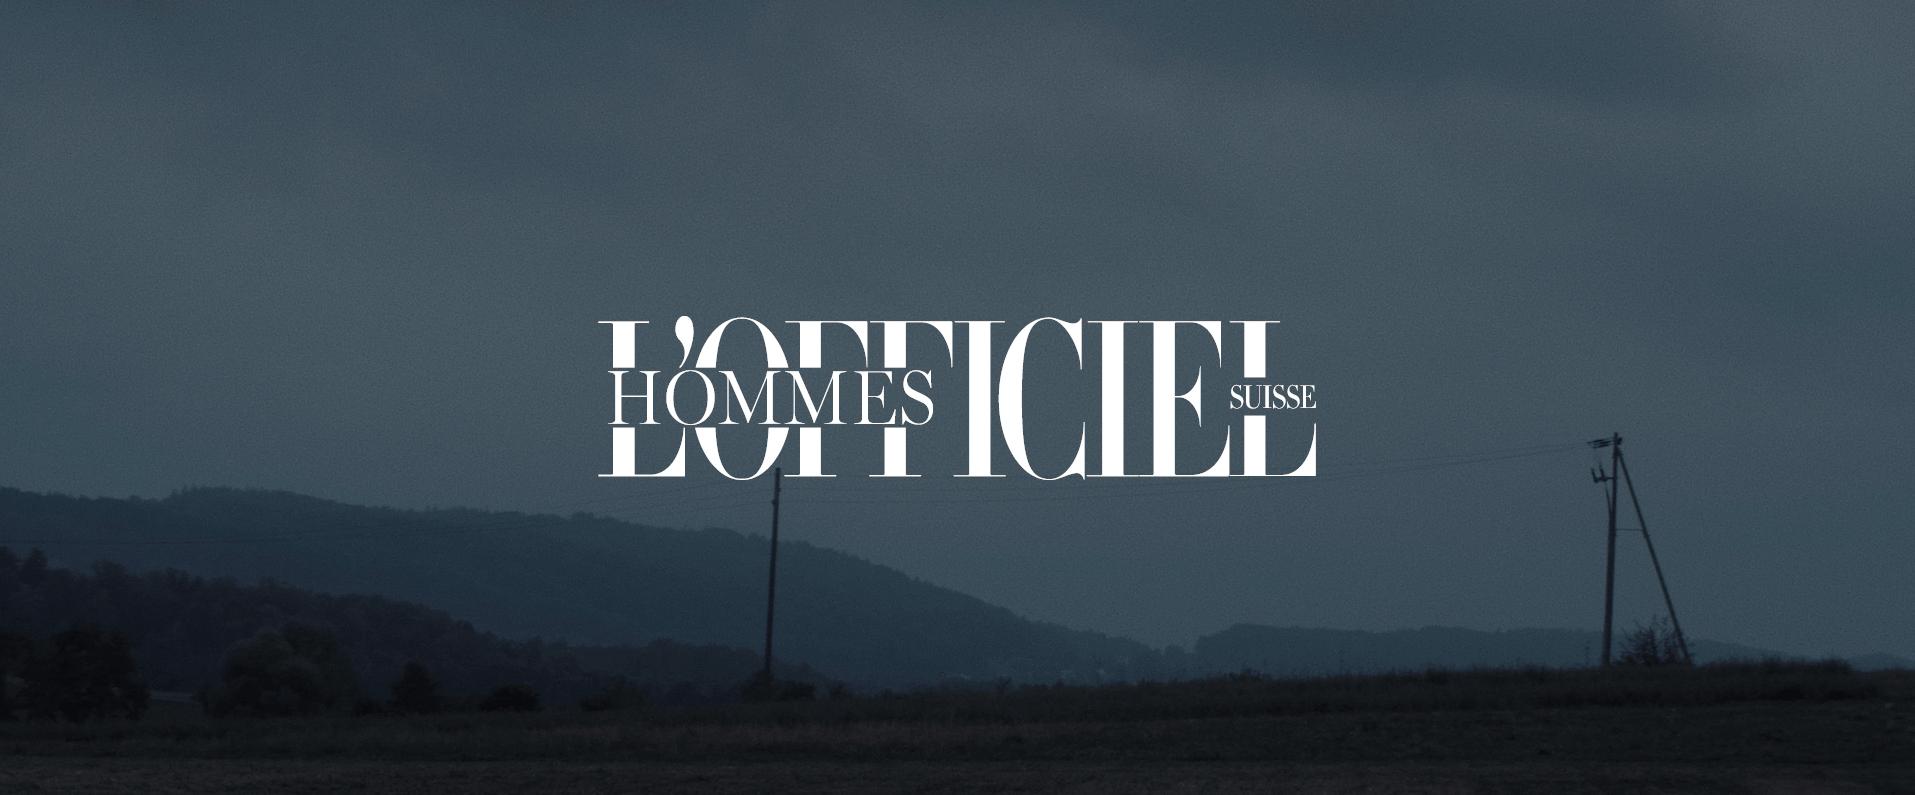 L'OFFICIEL HOMMES - HINTERLAND